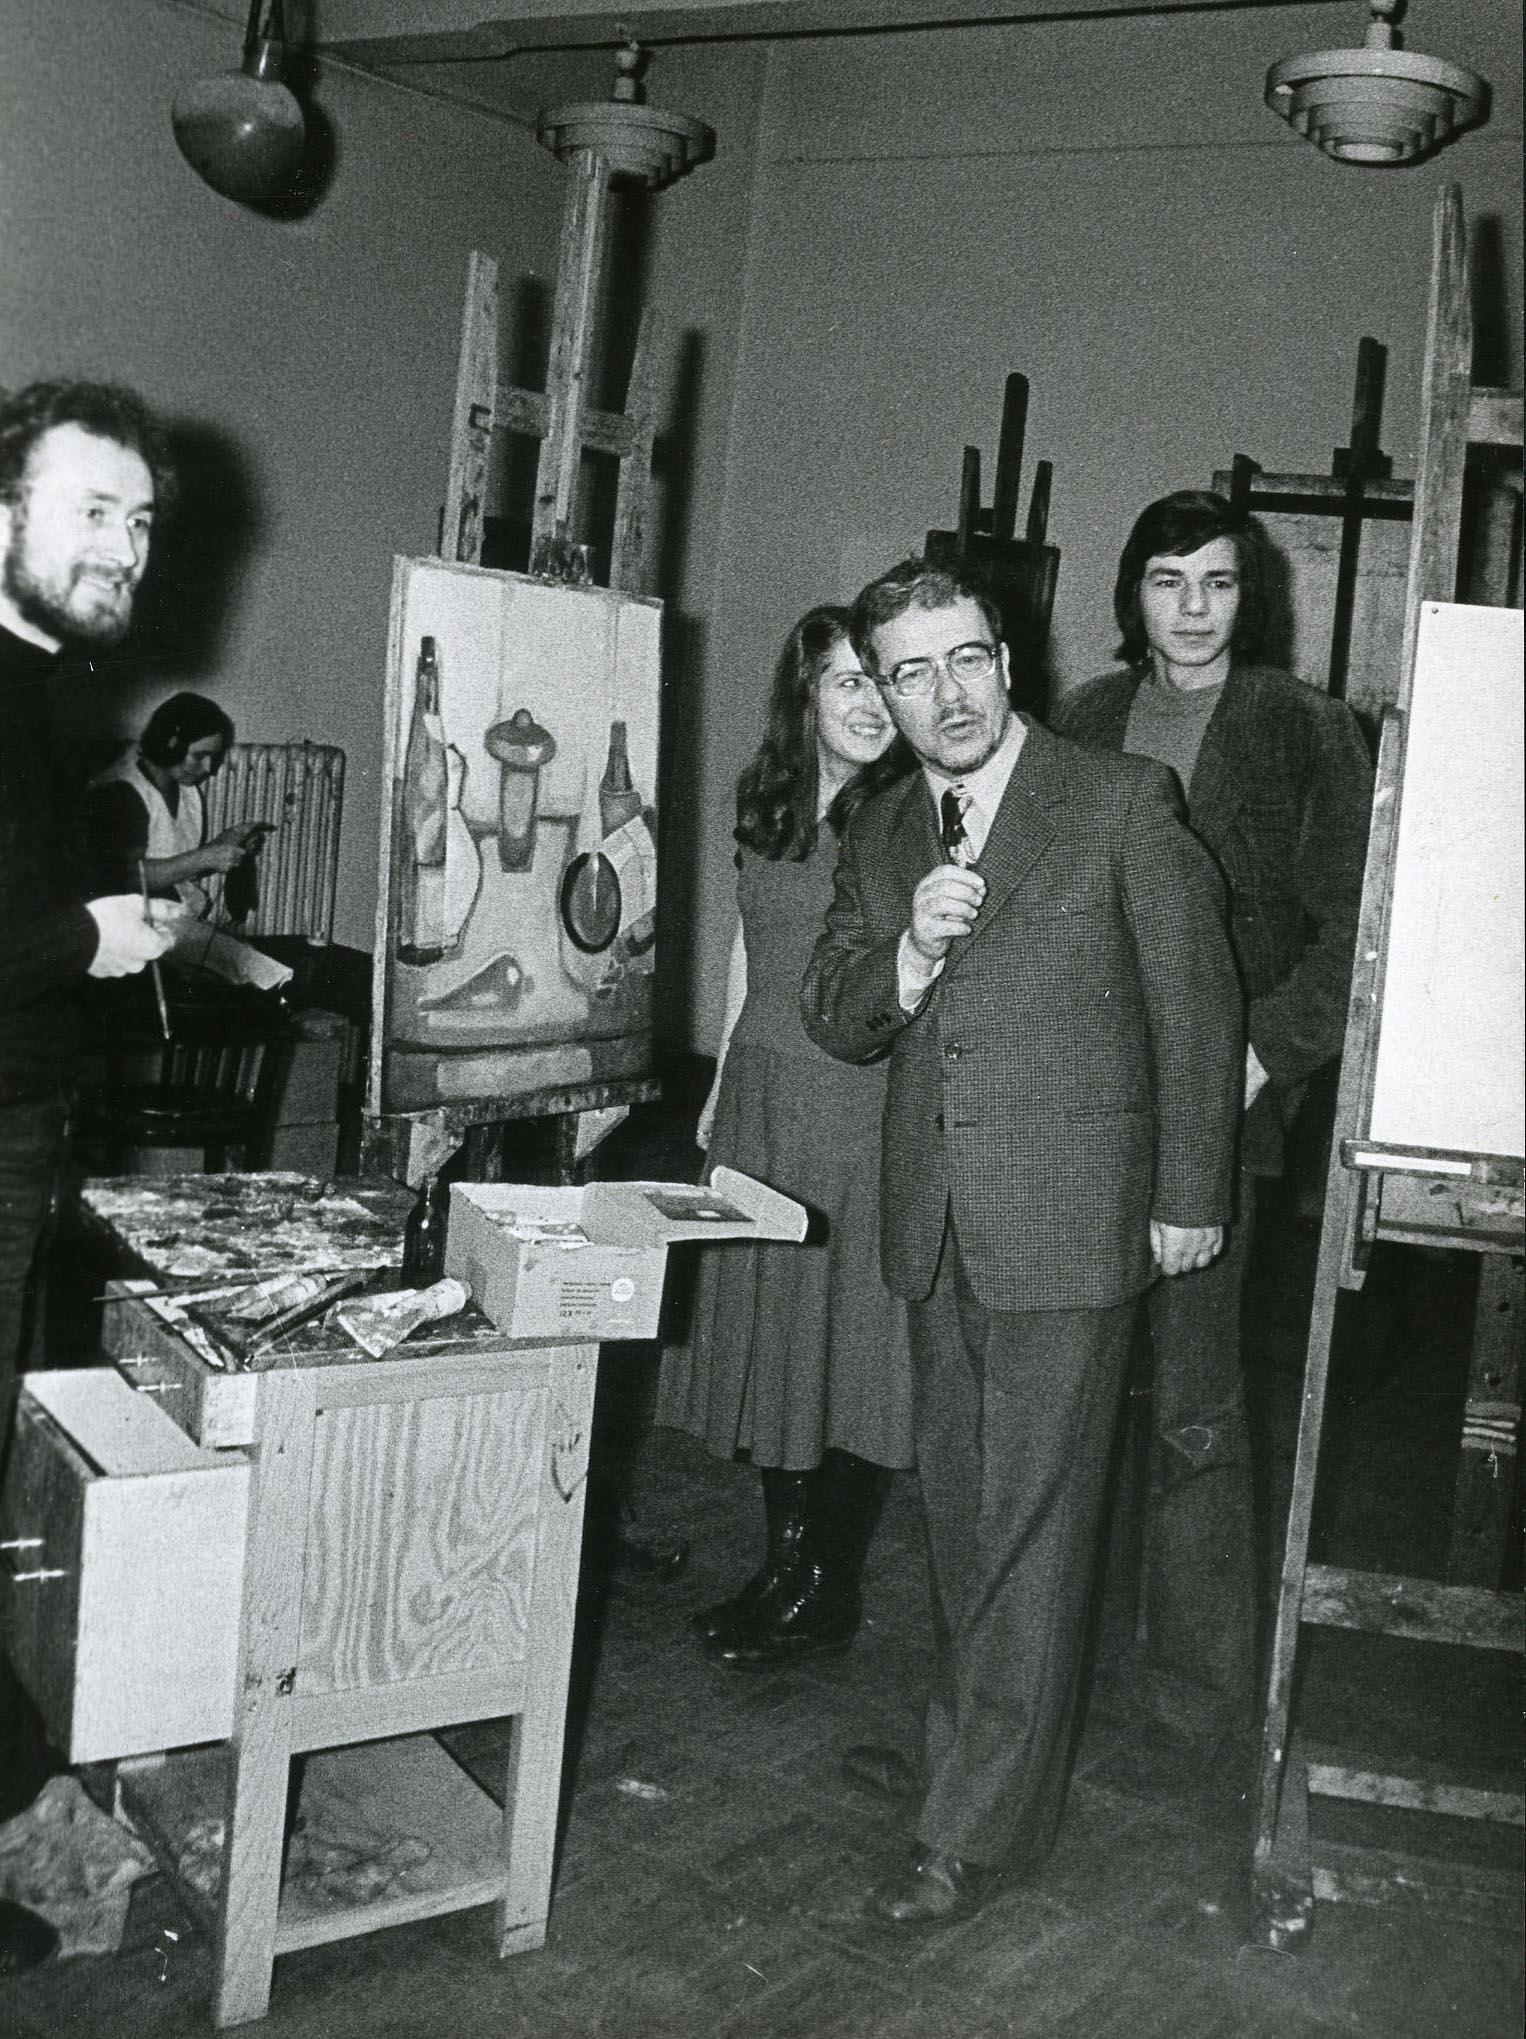 Ze studentami, ok. 1970